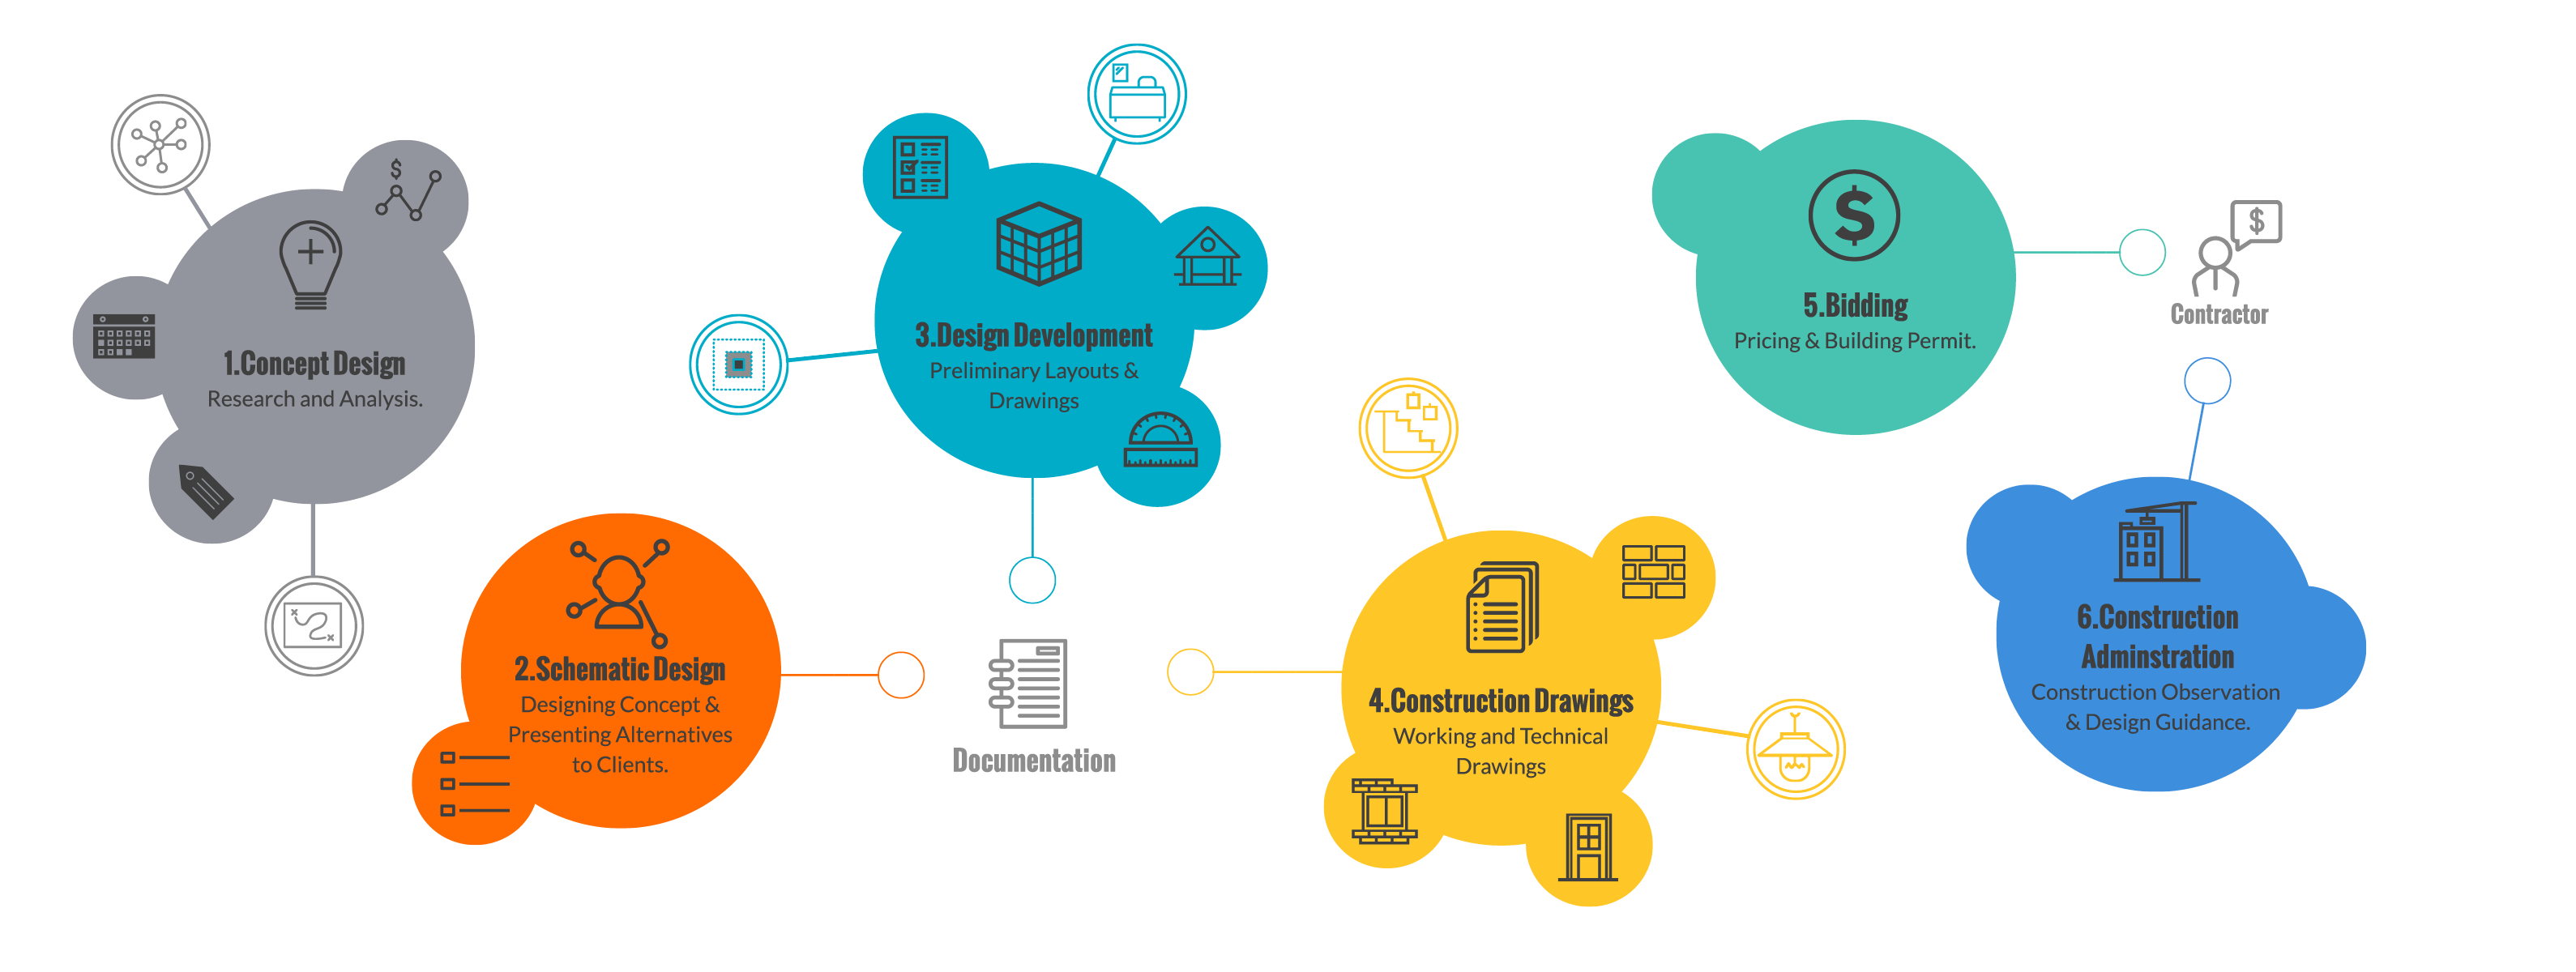 Simlab Integration In Architectural Design Process Simlab